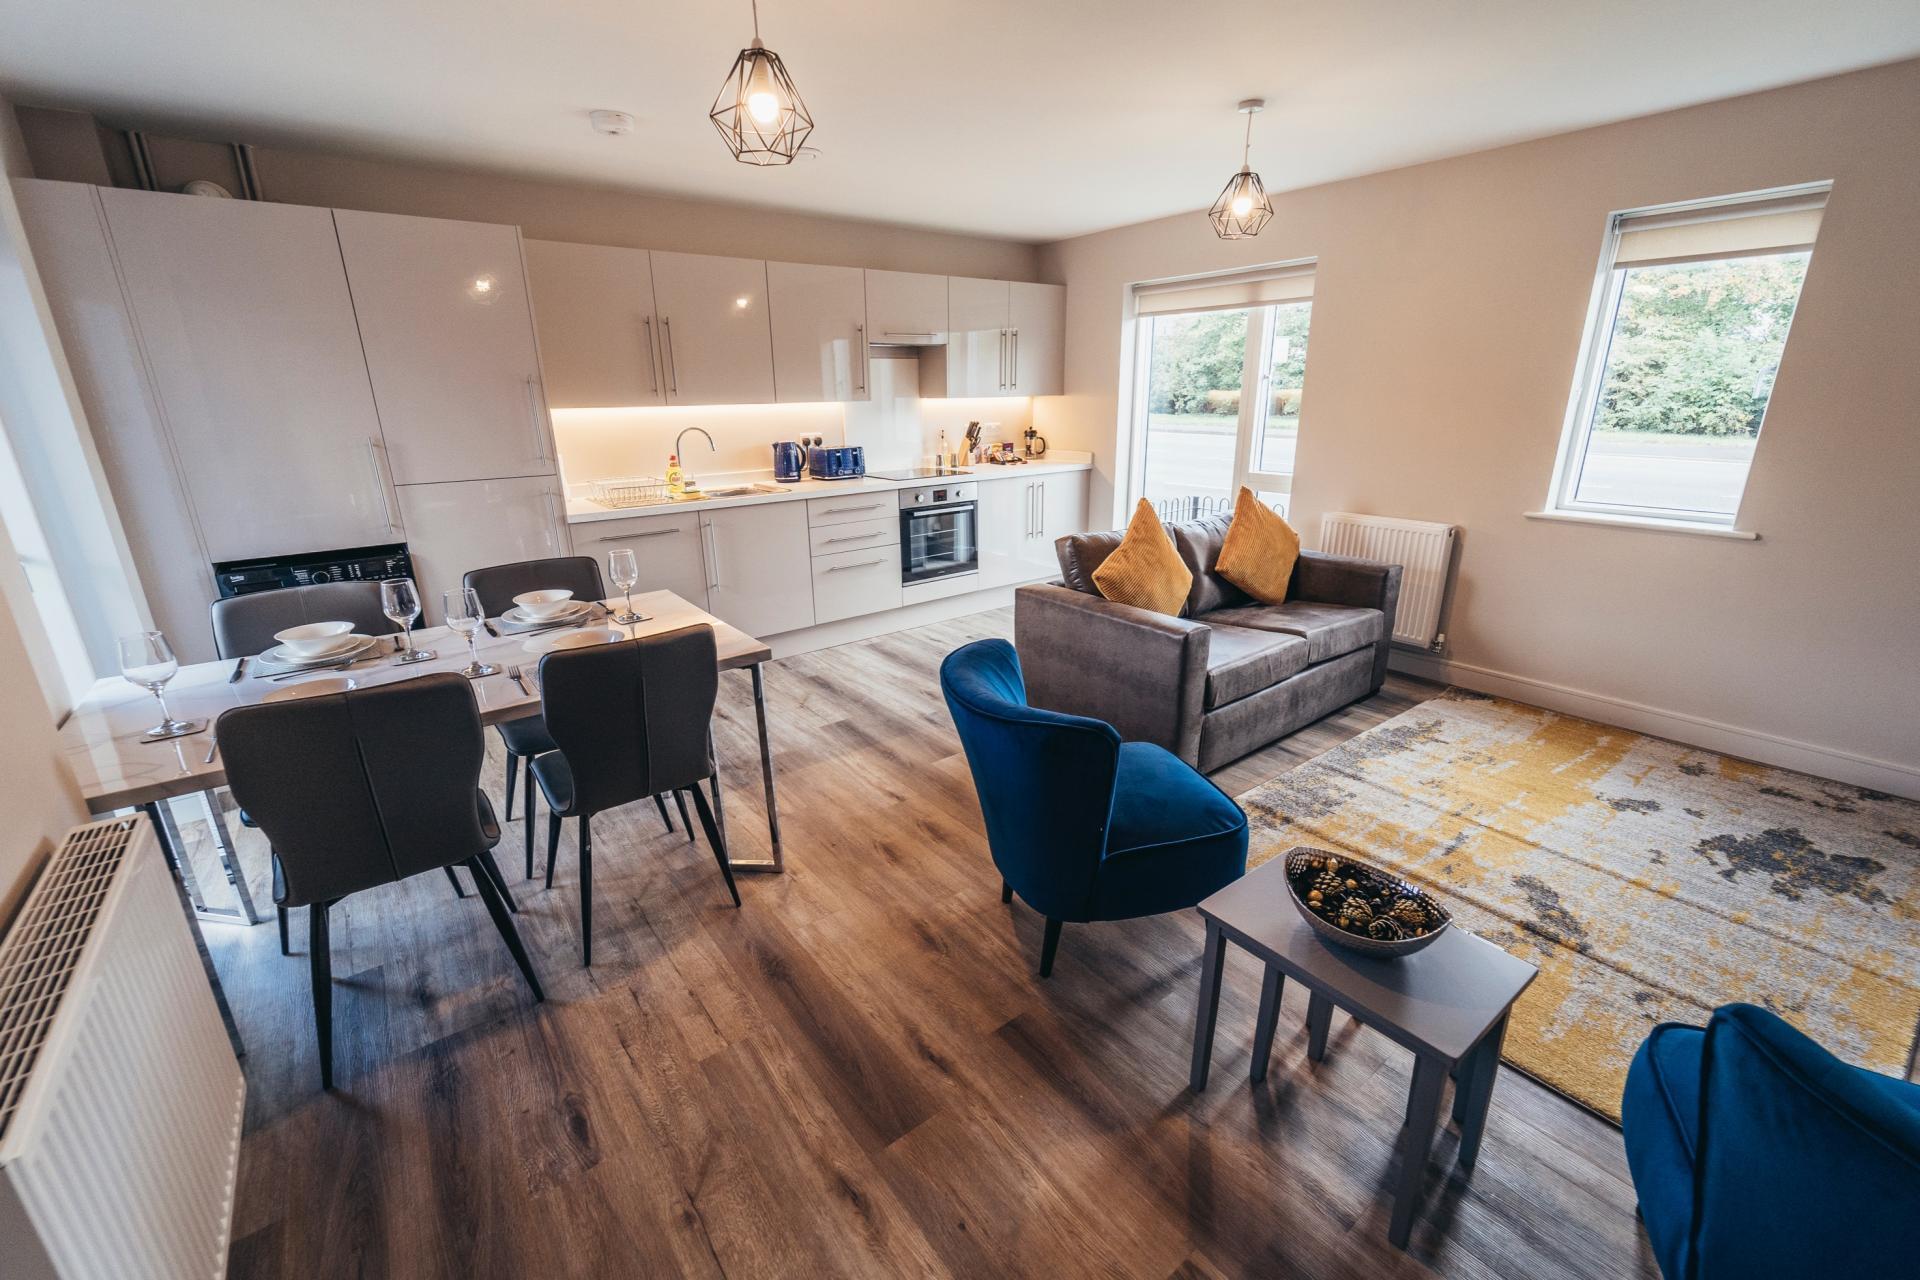 Dining area at Devonshire Court Apartments, West Bridgford, Nottingham